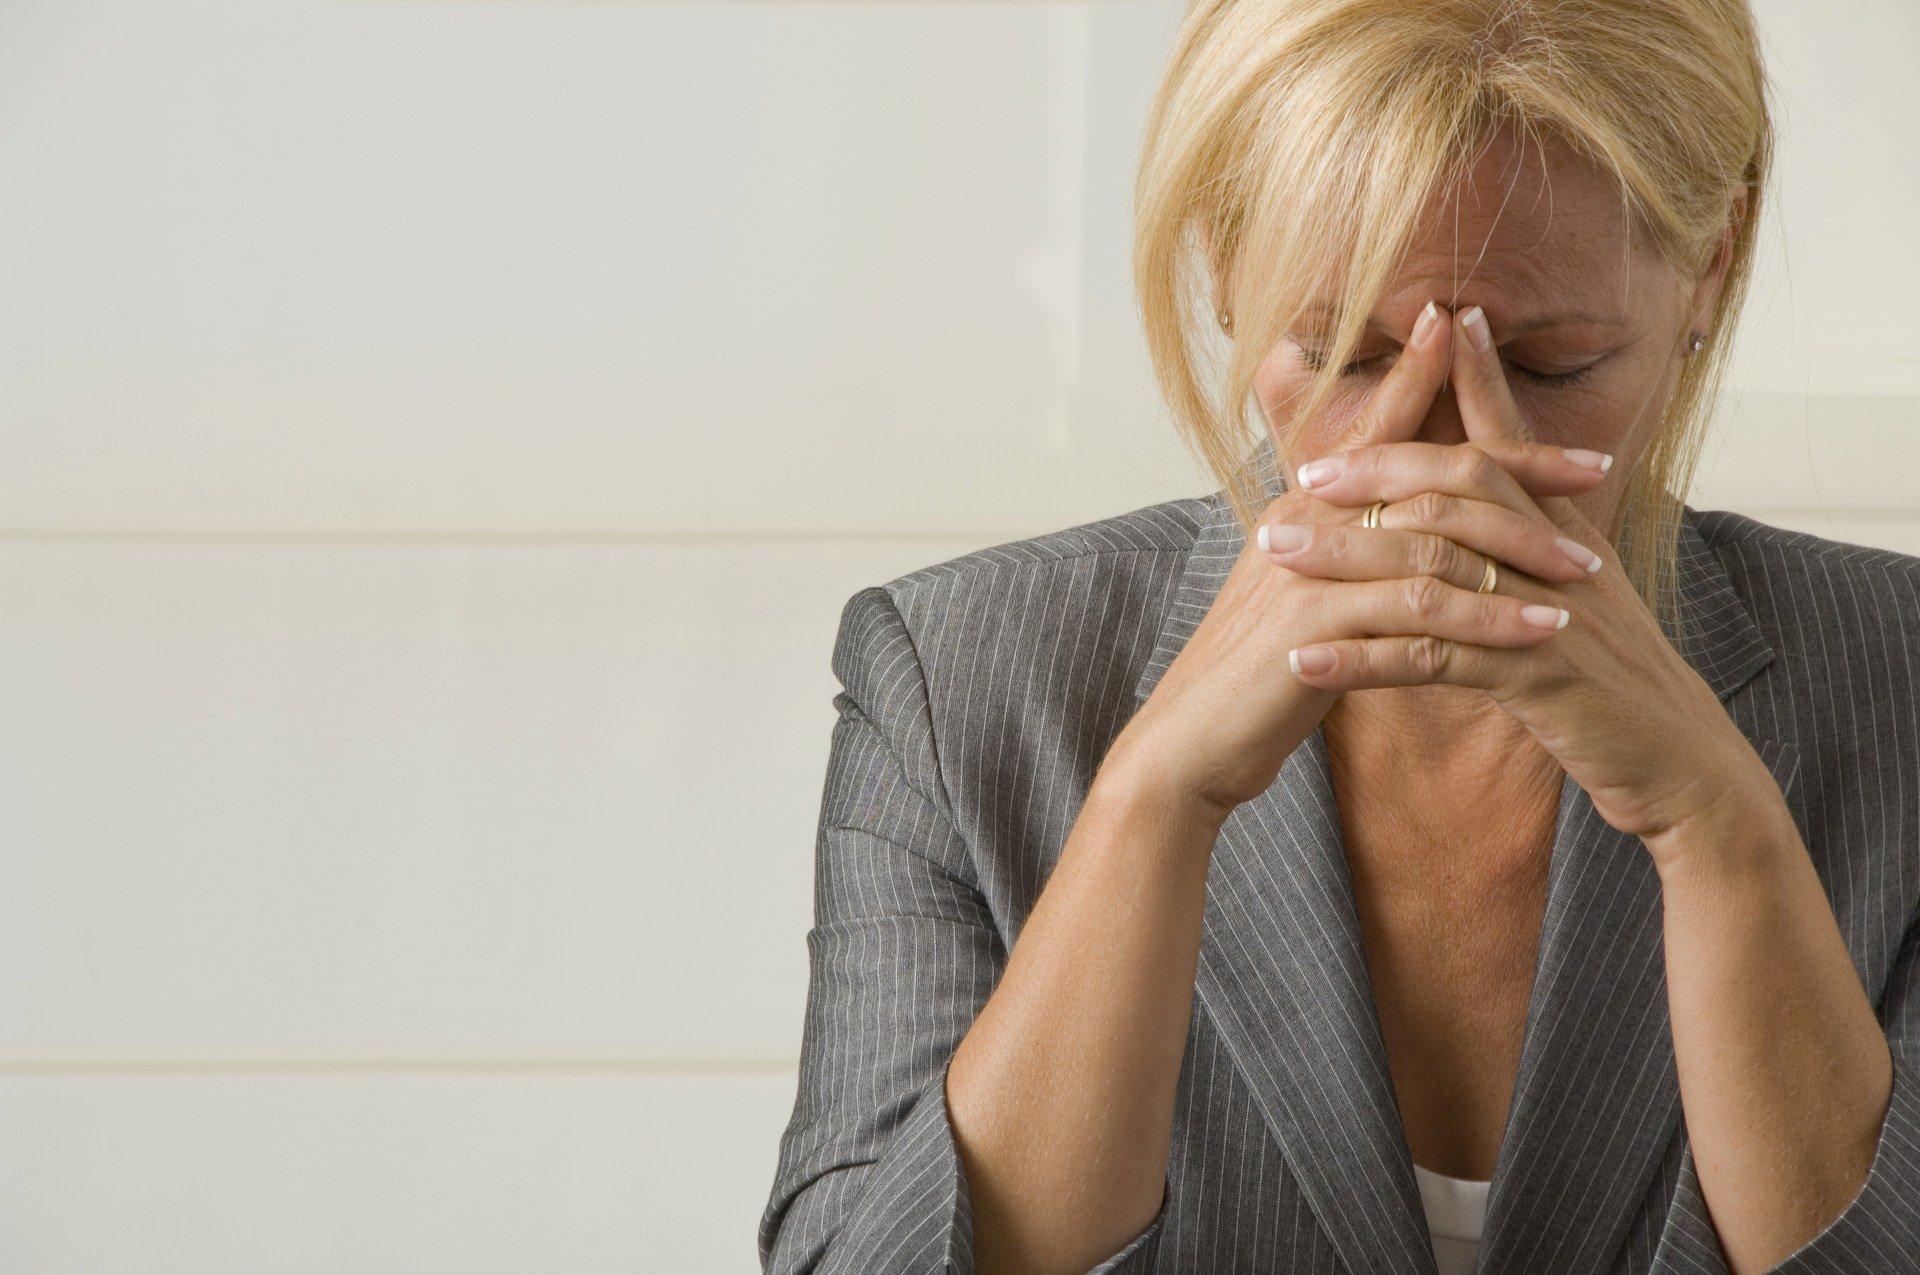 woman head in hands - MyCRA Lawyers can help | 1300 667 218